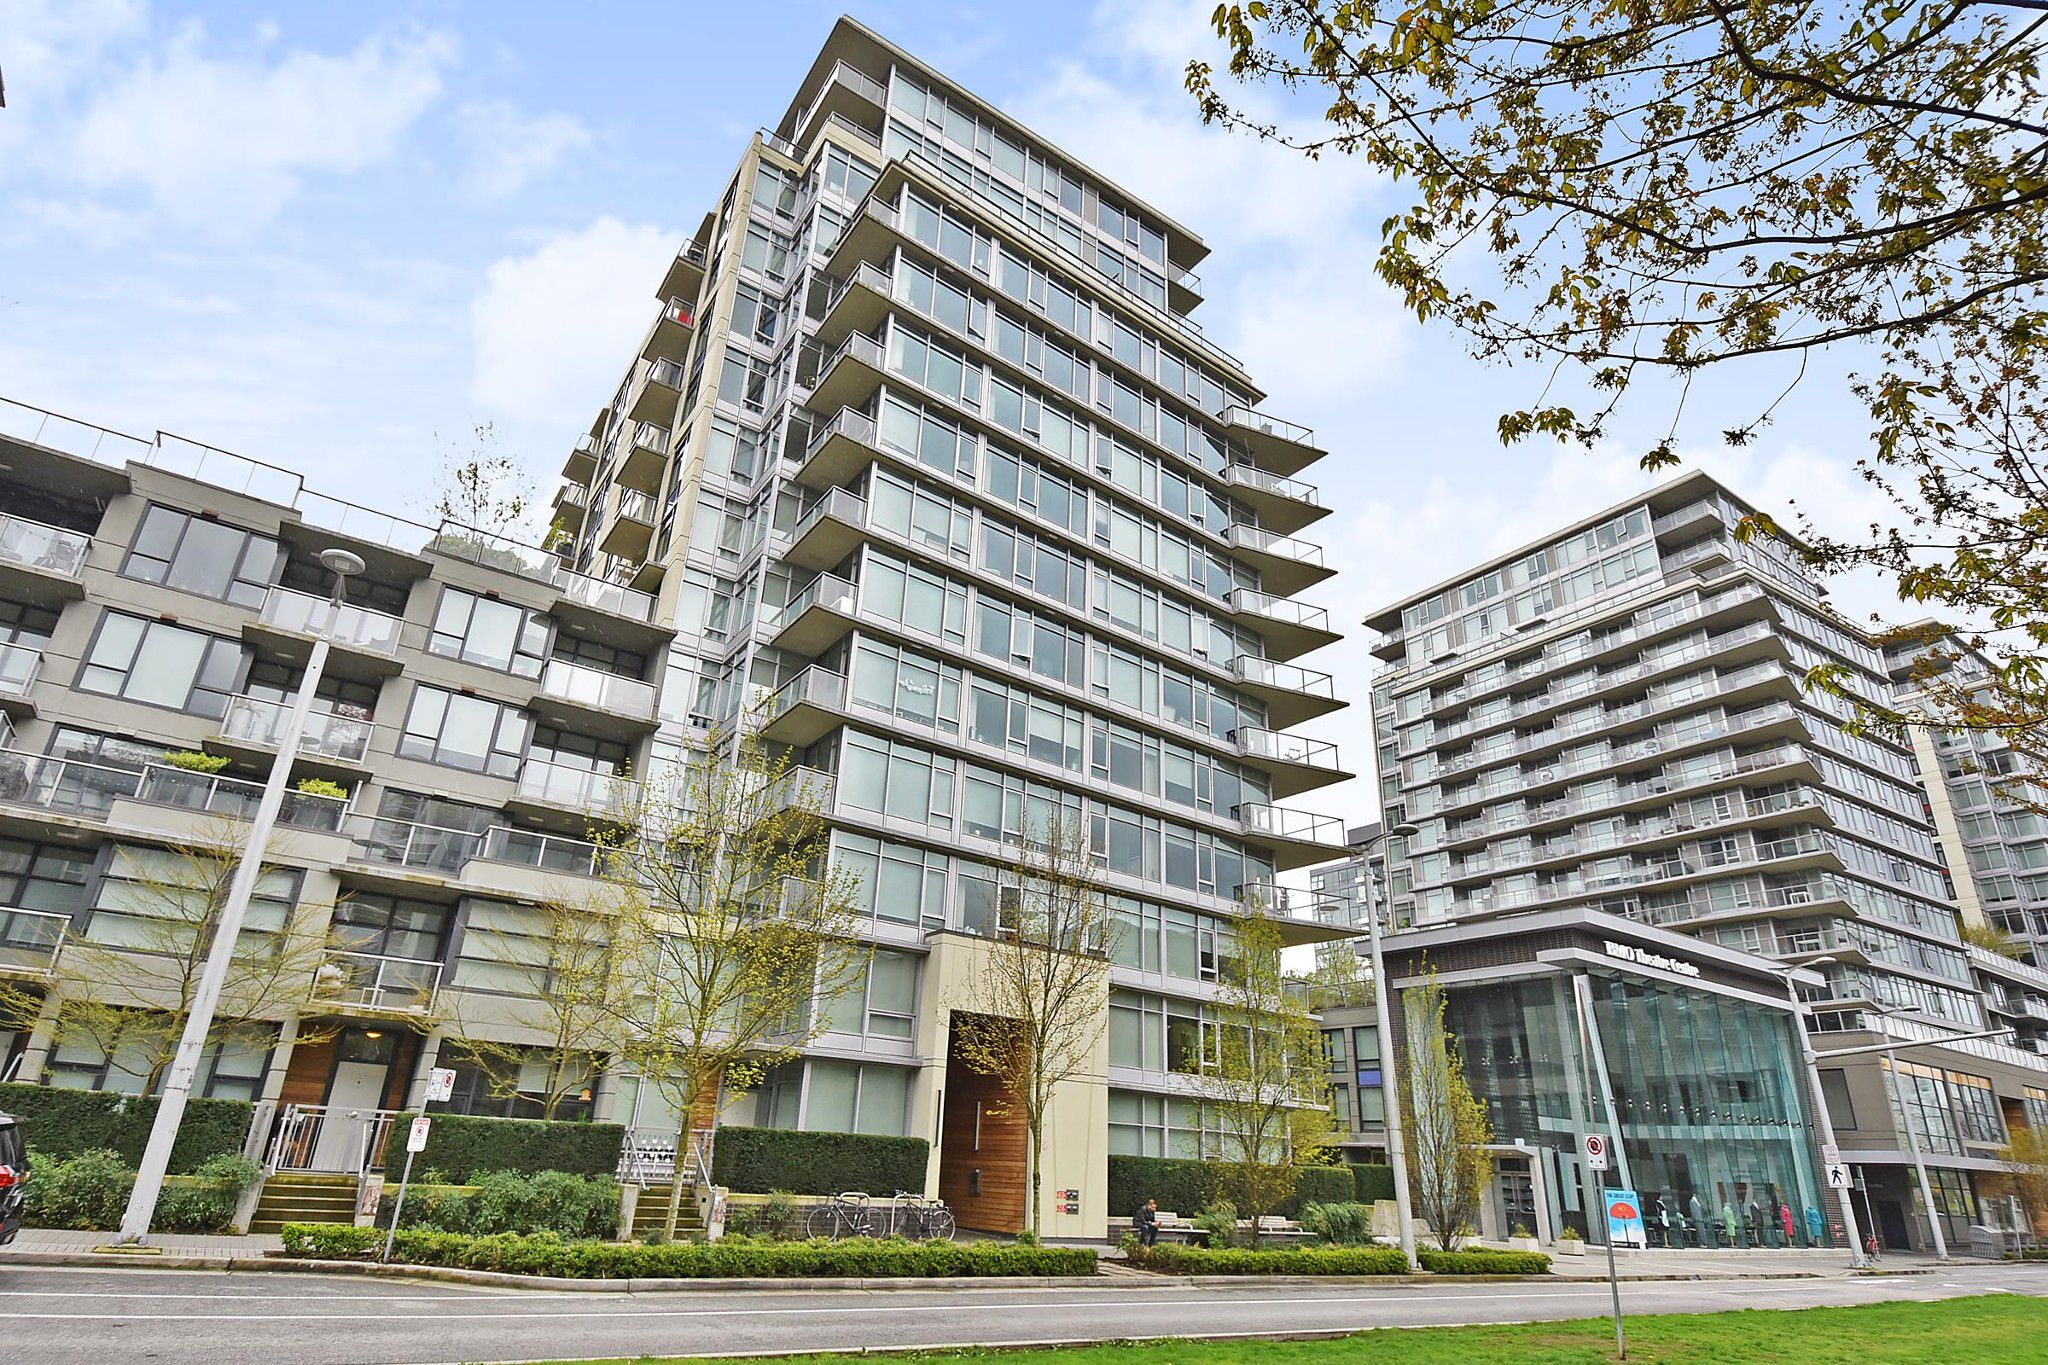 Main Photo: 306 138 W 1ST AVENUE in Vancouver: False Creek Condo for sale (Vancouver West)  : MLS®# R2360592